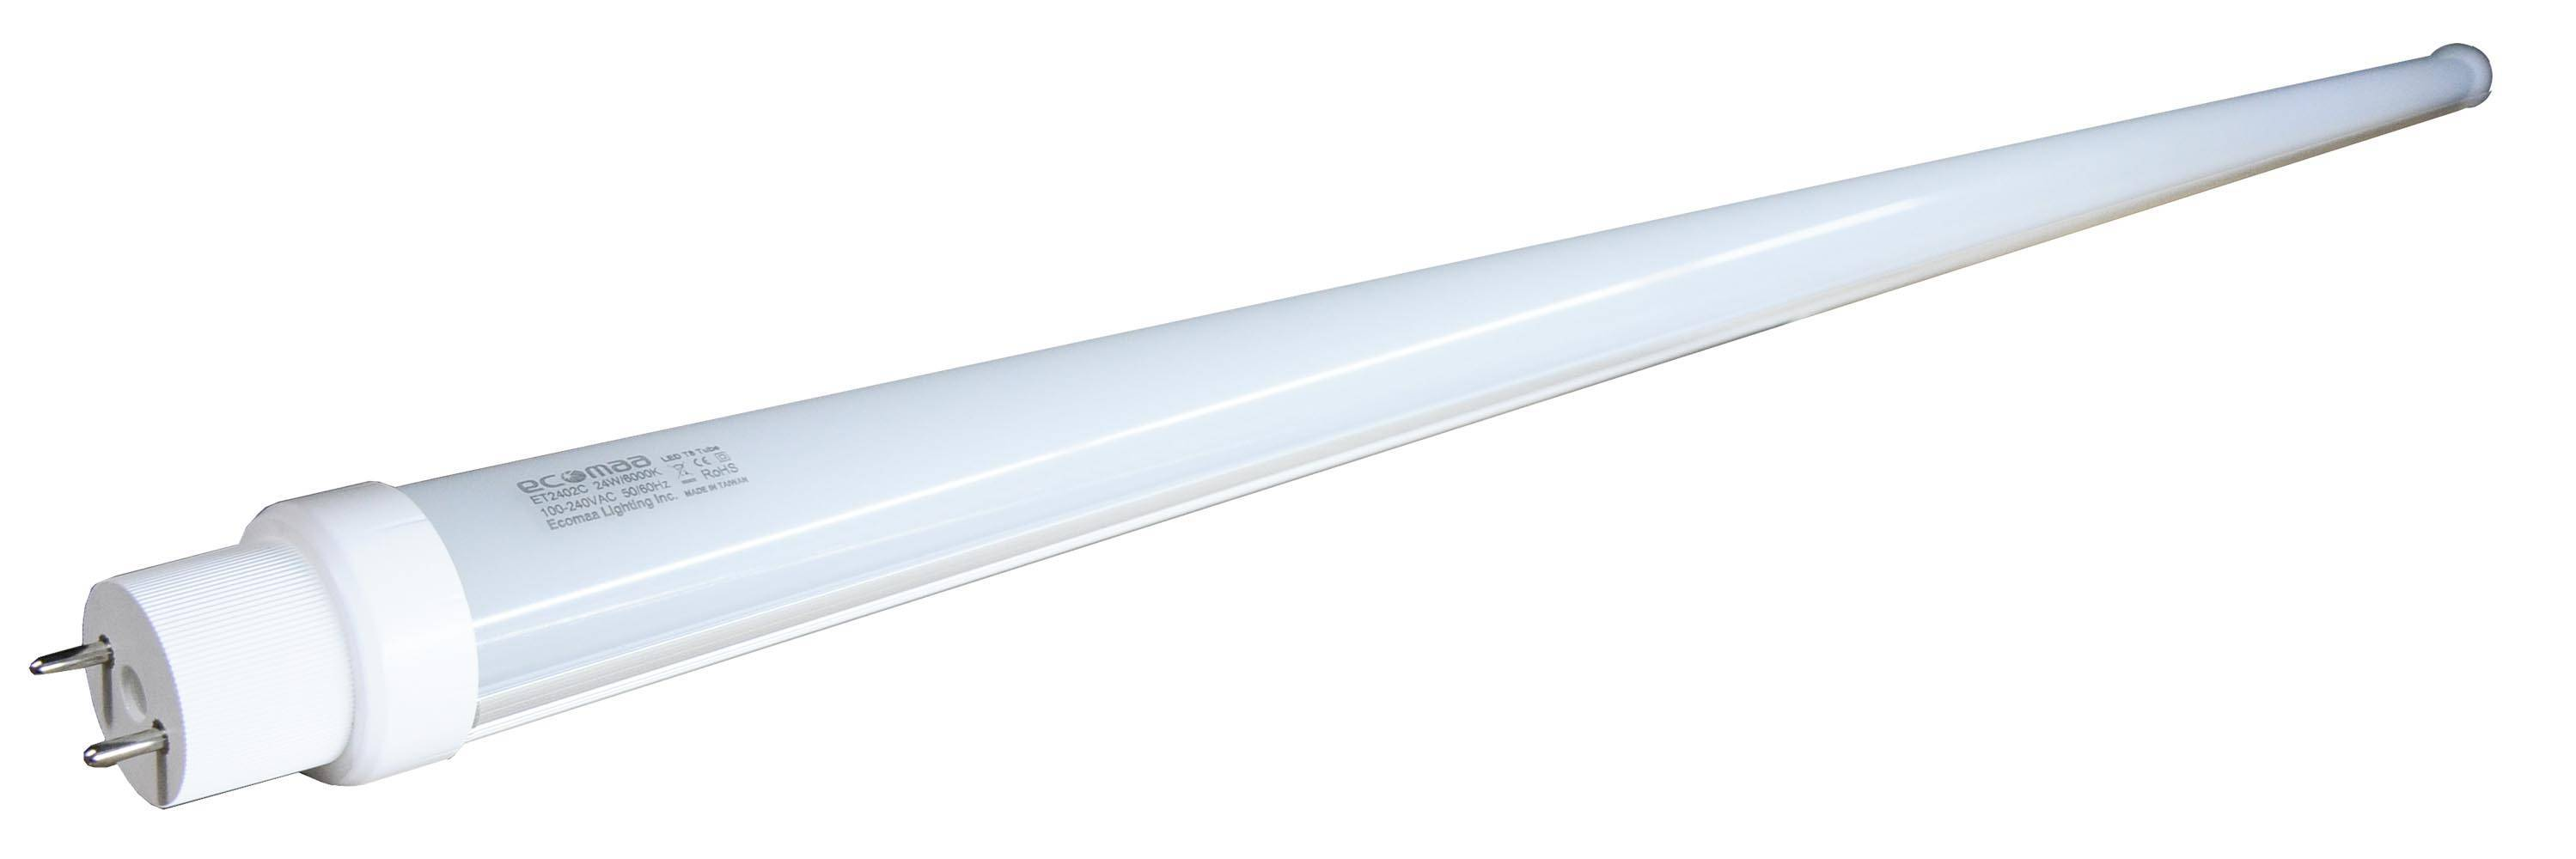 Ecomaa- Tube Series 12W&18W&24W&30W LED Tube Light